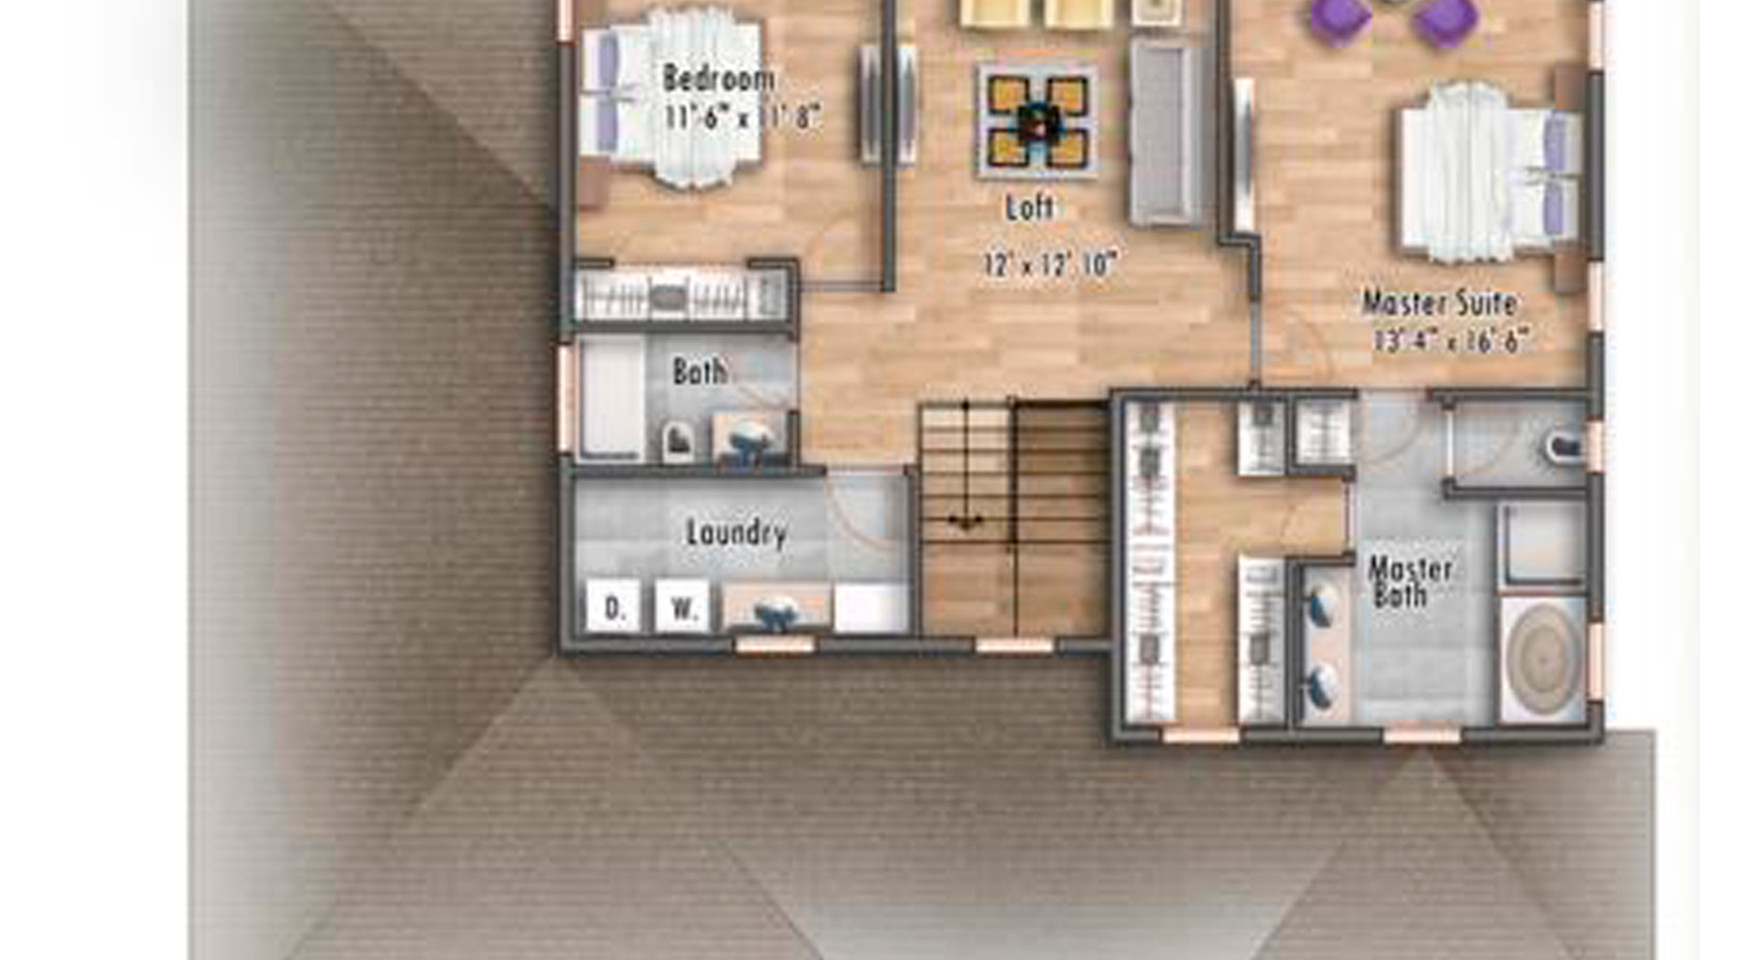 moreno valley first floor plan.jpg